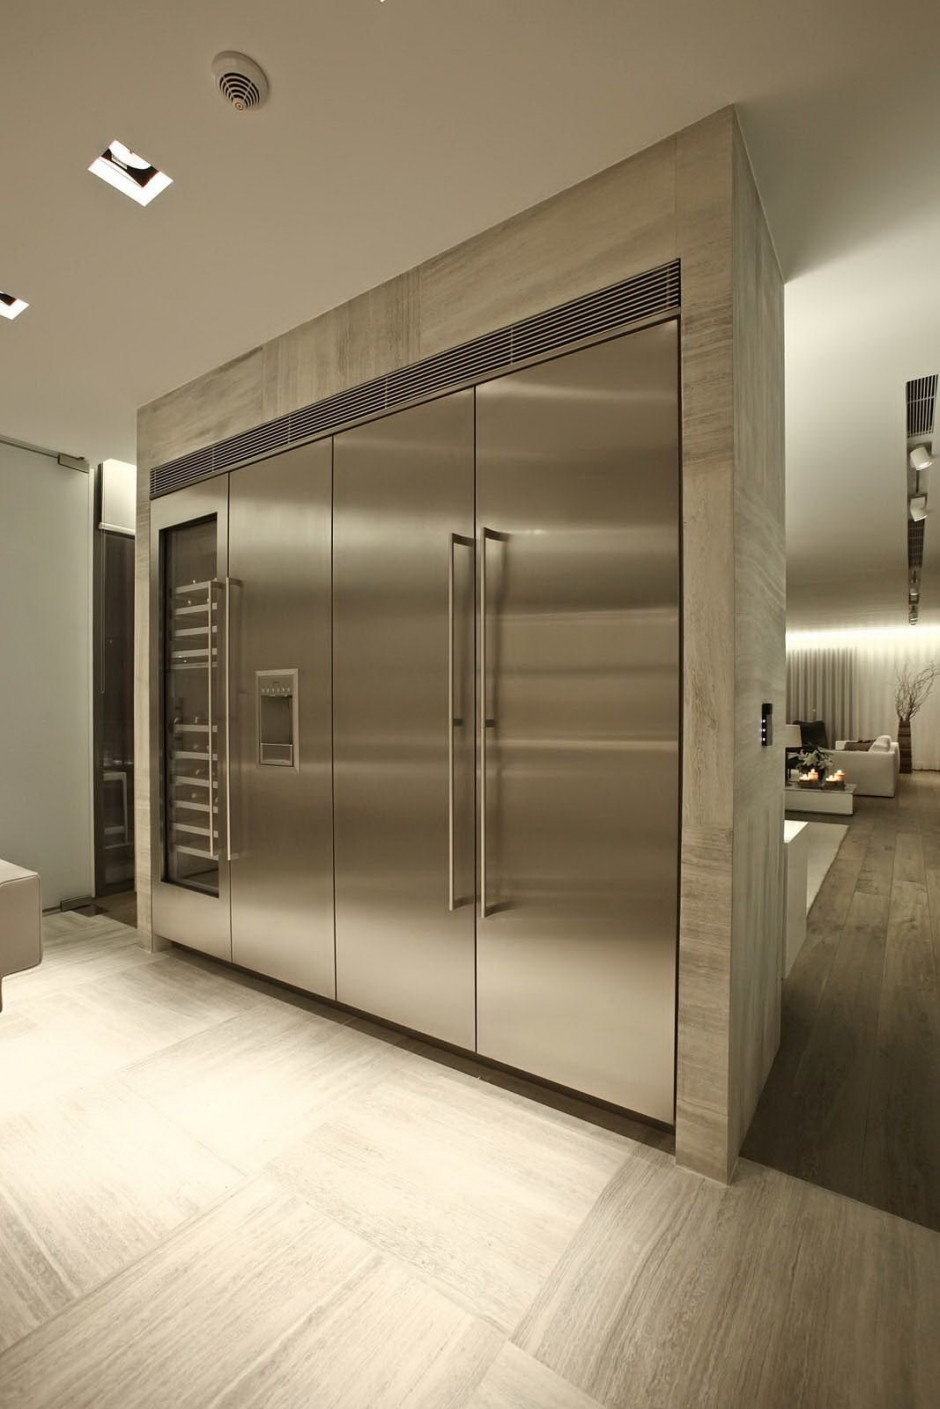 Large Stainless Steel Appliances Interior Design Ideas